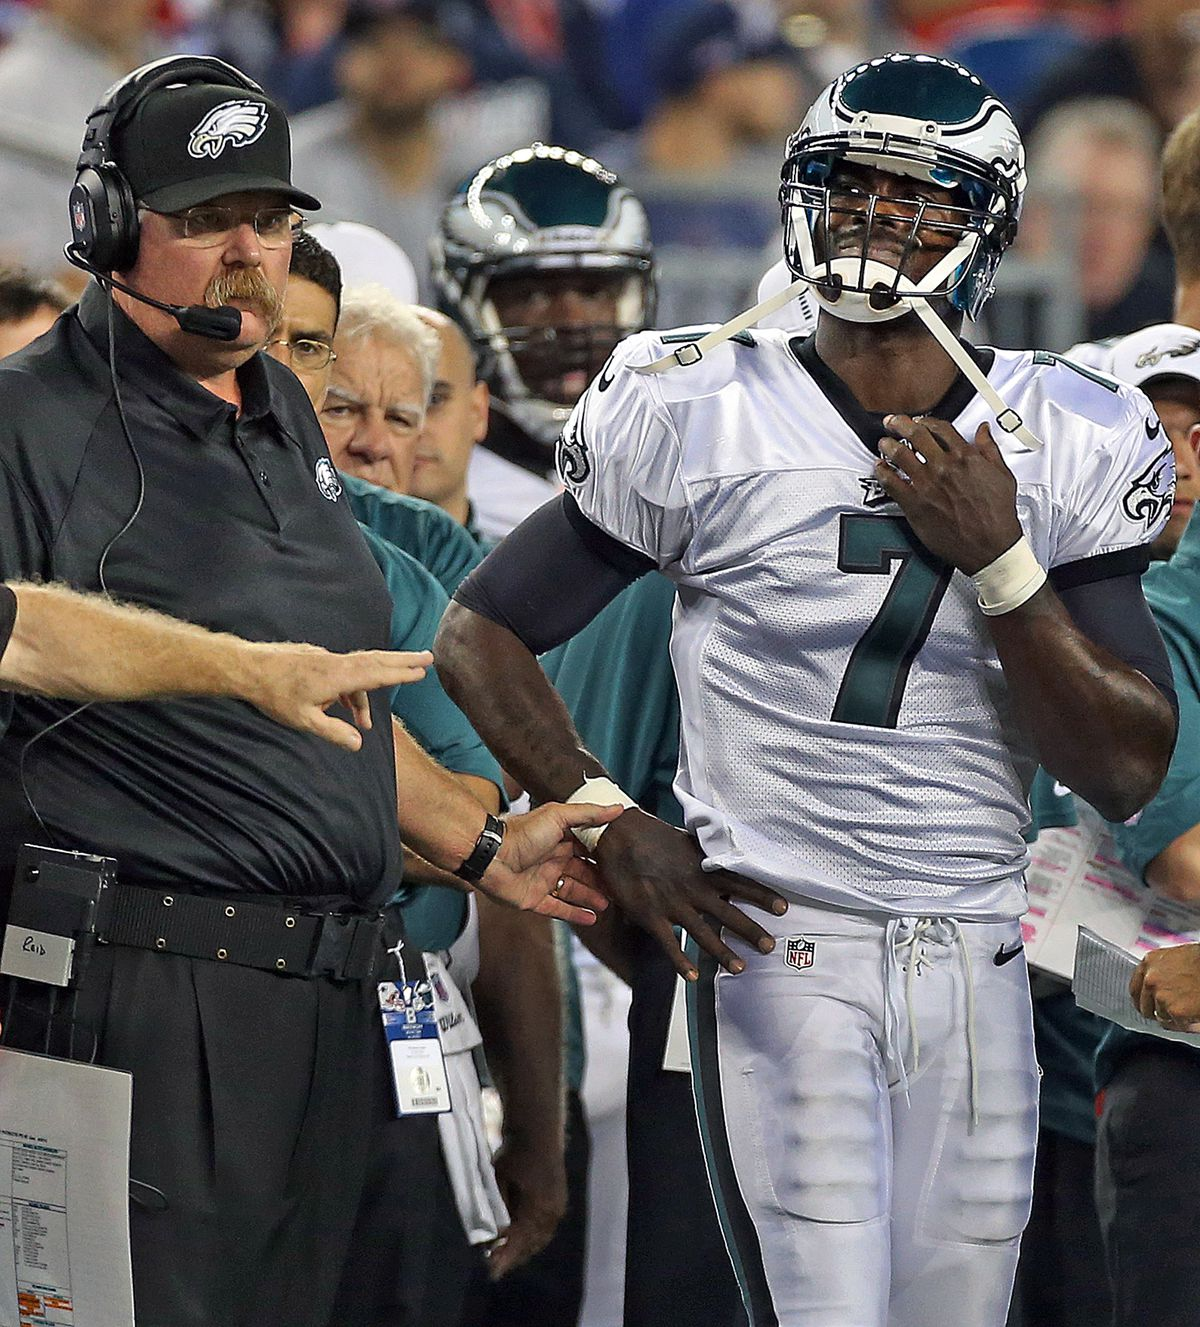 NFL Preseason: Philadelphia Eagles Vs. New England Patriots At Gillette Stadium